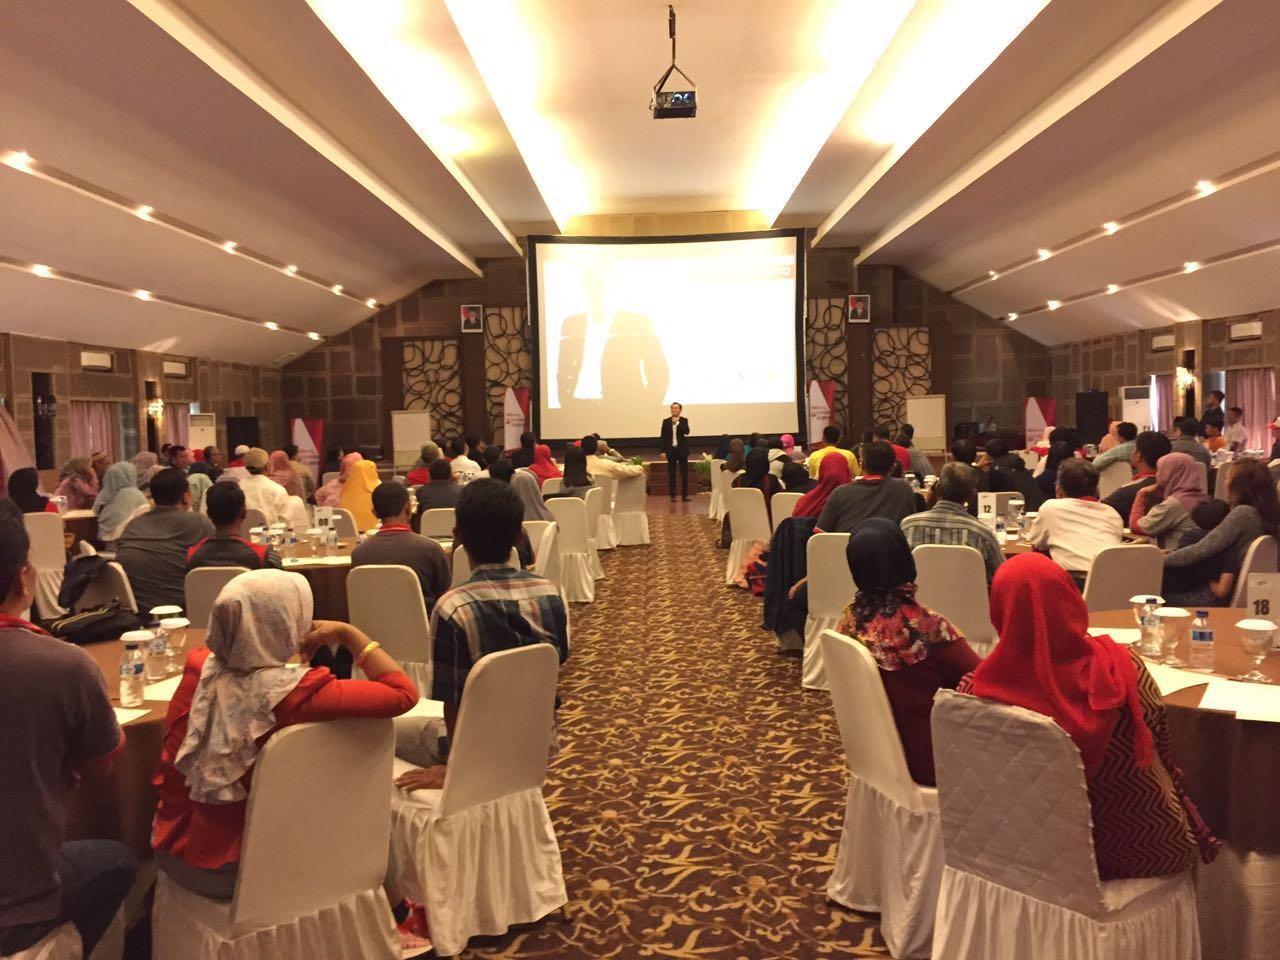 Sahabat Menuju Perubahan | Gathering SRC PT. HM Sampoerna